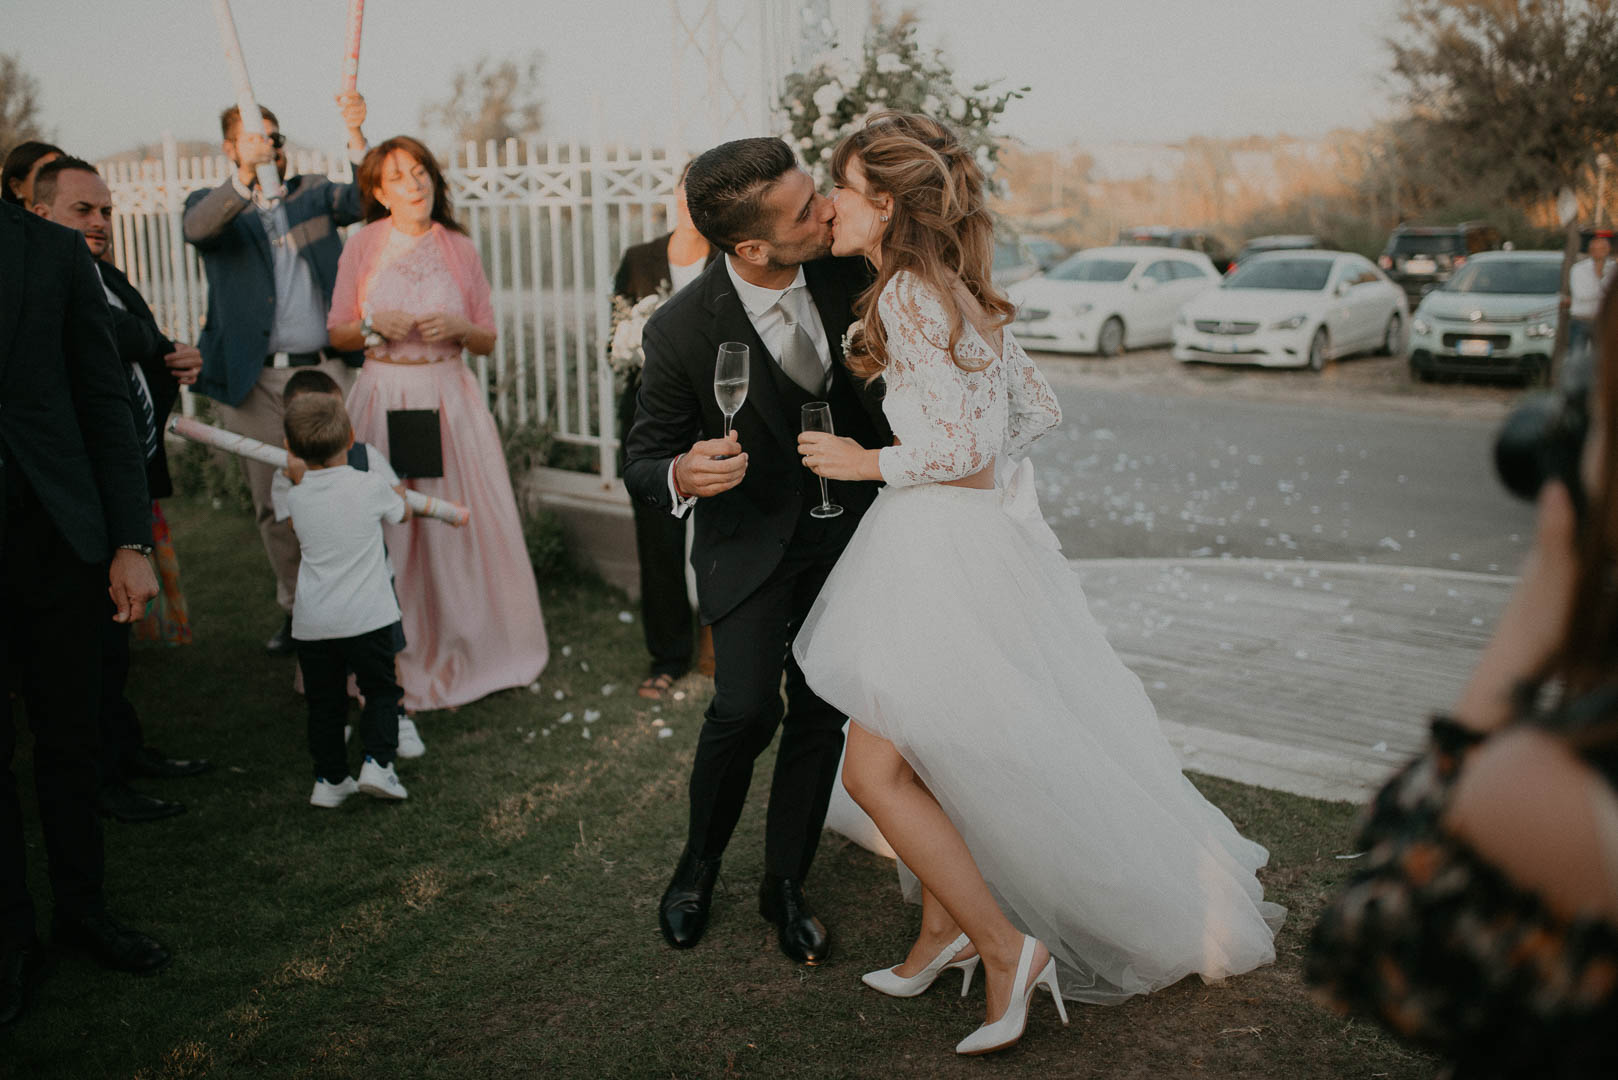 wedding-photographer-destination-fineart-bespoke-reportage-napoli-nabilah-vivianeizzo-spazio46-110